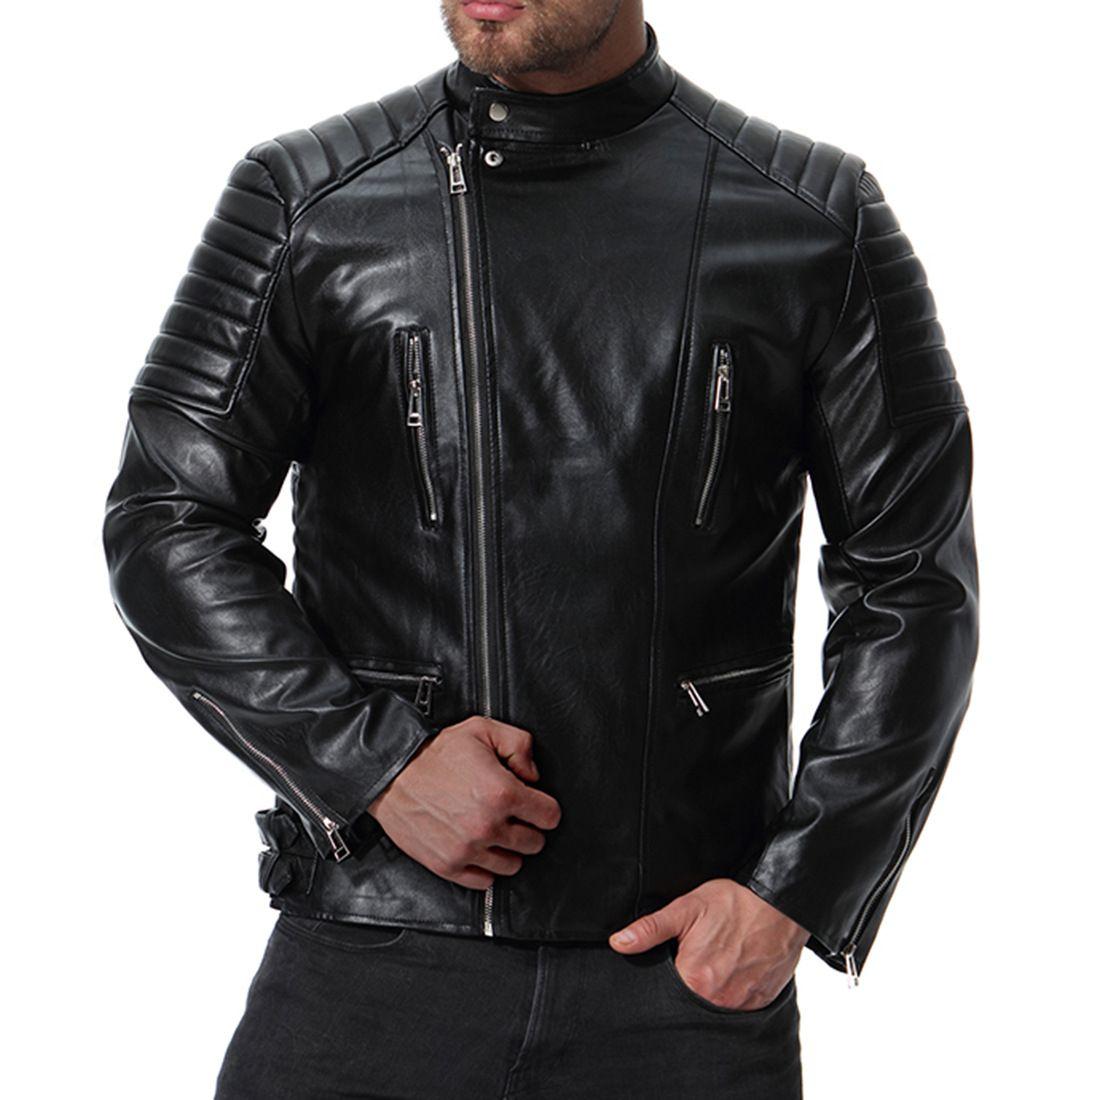 MarKyi 2018 autunno moda colletto alla coreana giacca in pelle da moto uomo plus size 5xl jaqueta de couro motoqueiro T190903